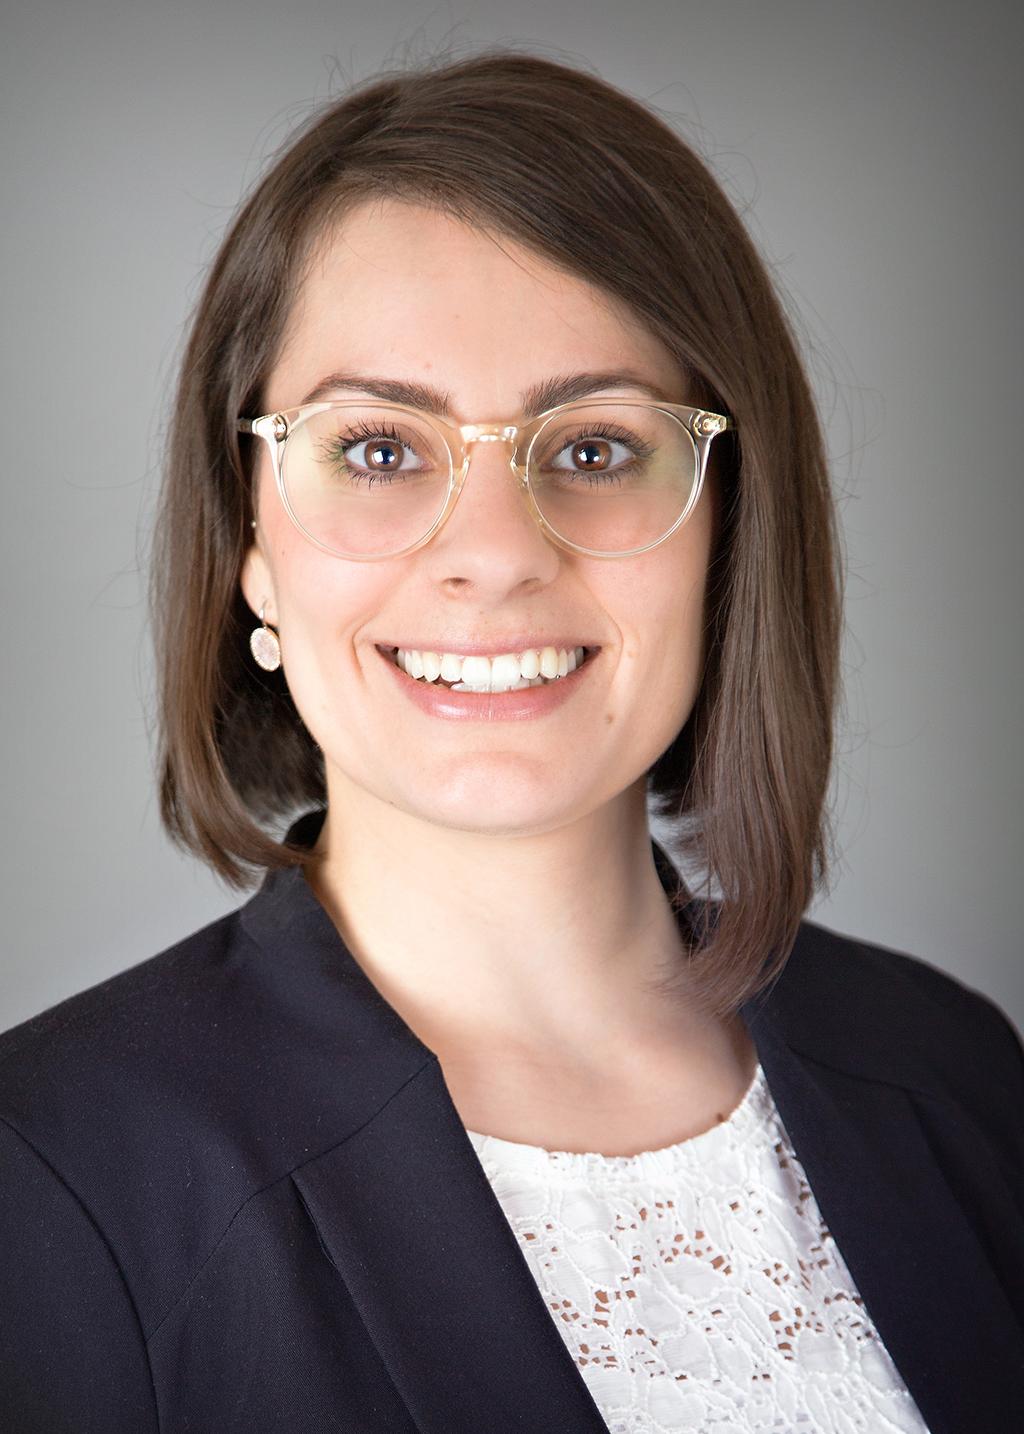 Juliana Saam